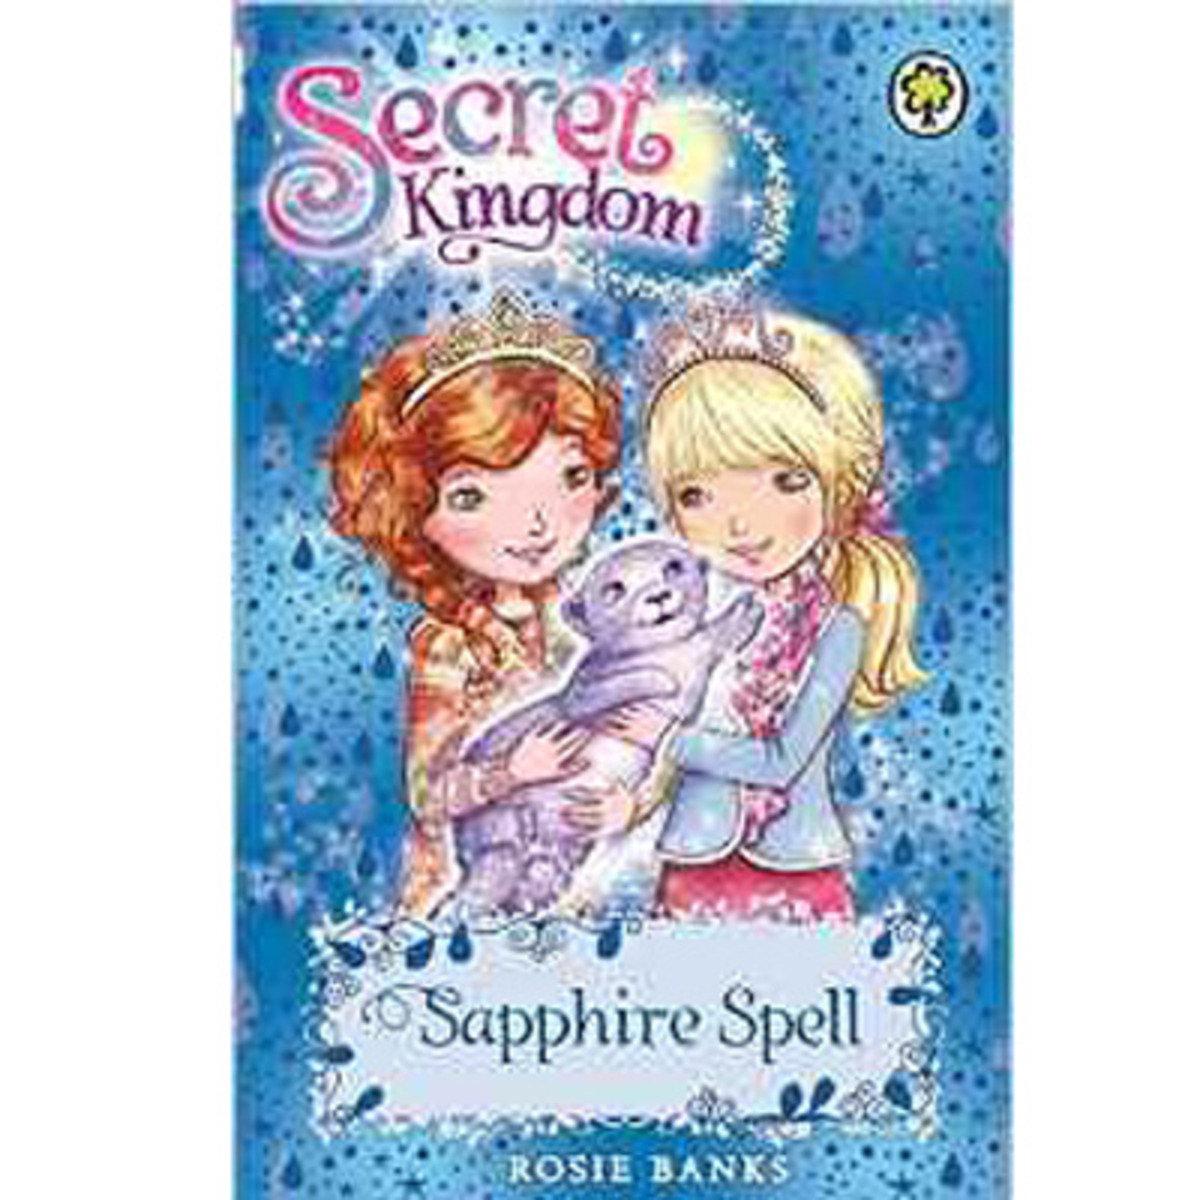 SECRET KINGDOM #24 SAPPHIRE SPELL 9781408329092